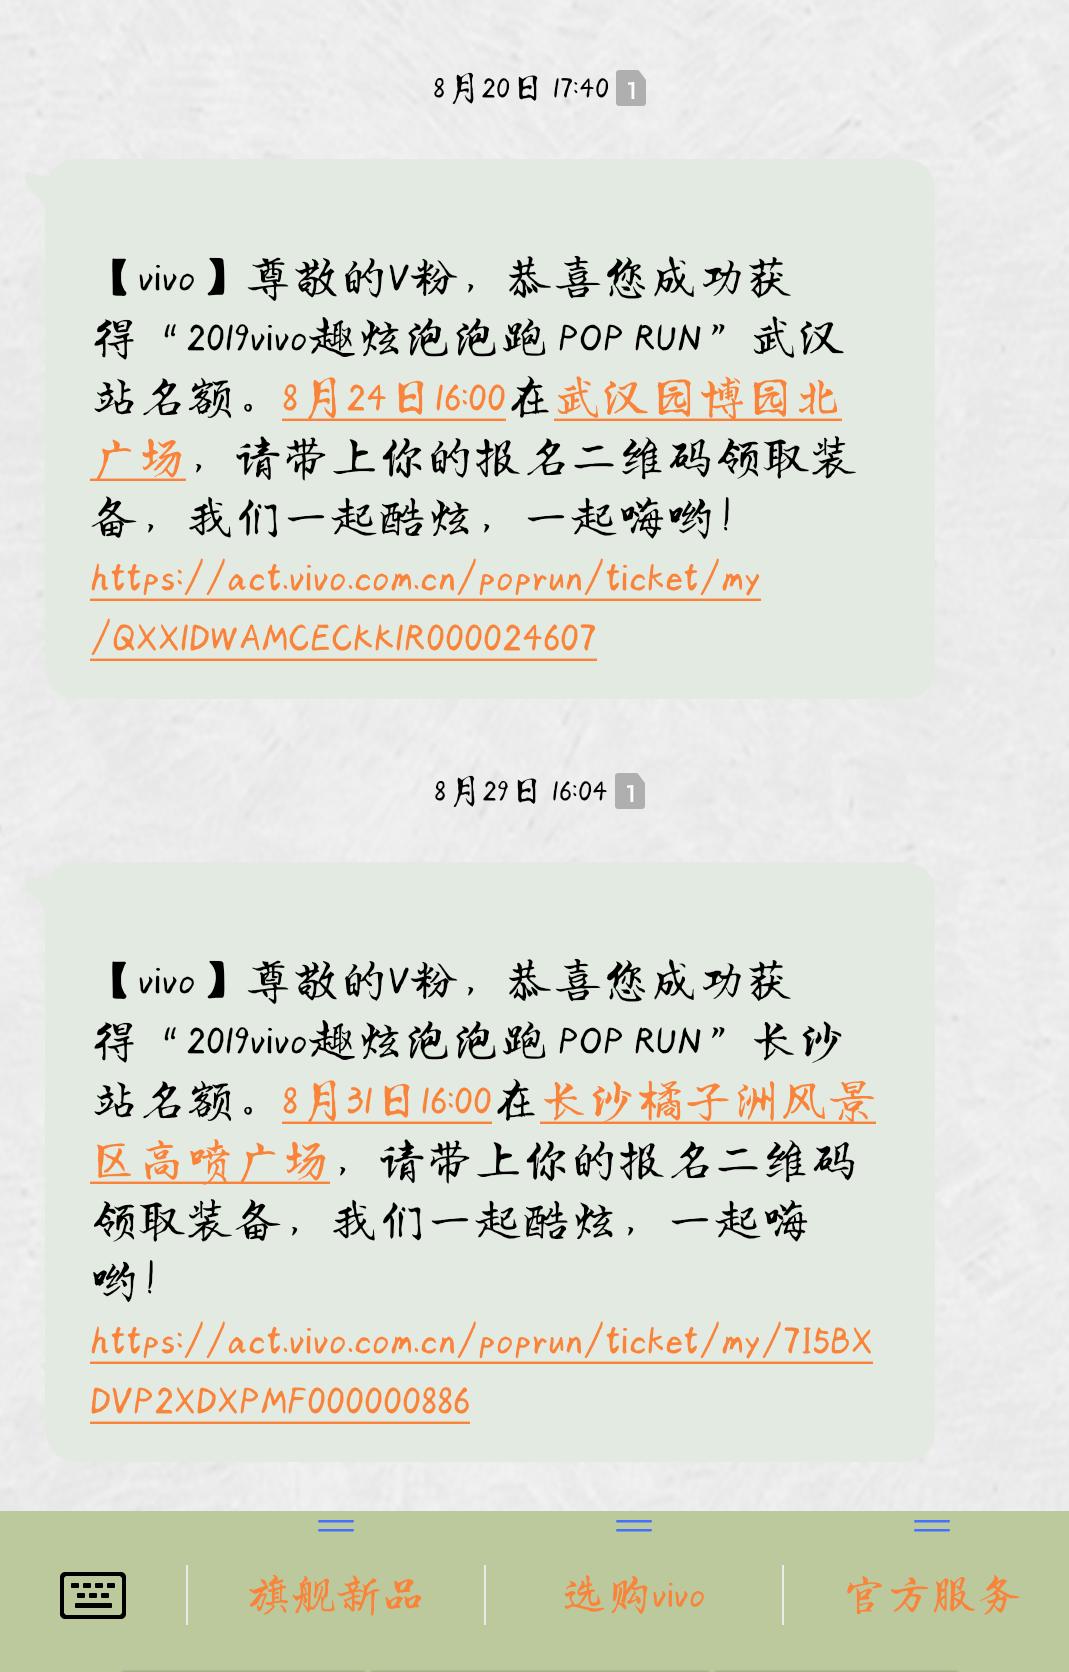 Screenshot_2019_0831_155559.png